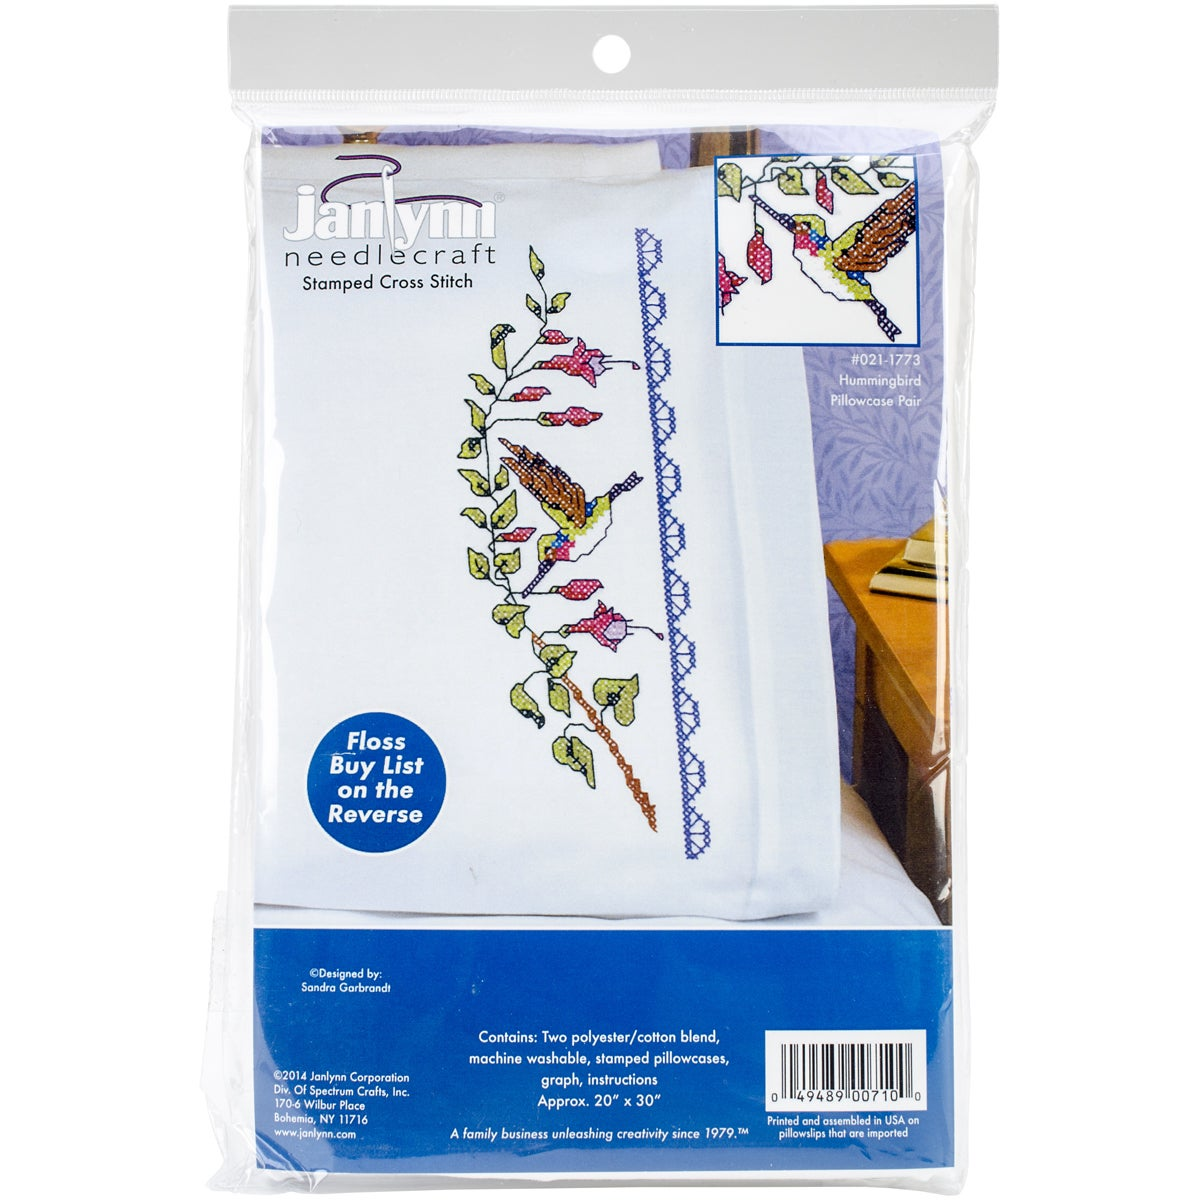 Janlynn Hummingbird Pillowcase Pair Stamped Cross Stitch-...